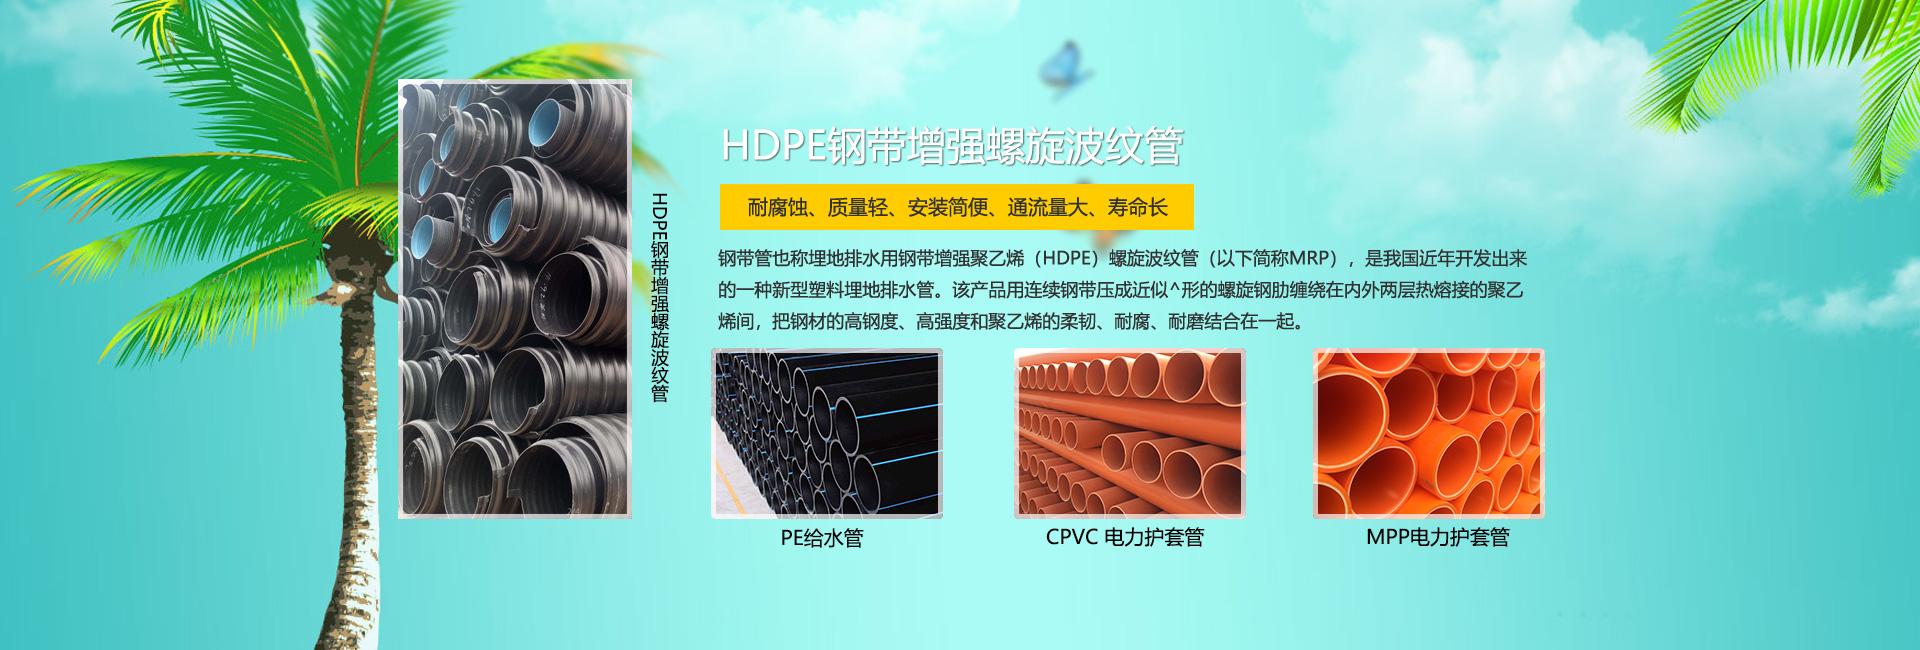 HDPE钢带增强螺旋管